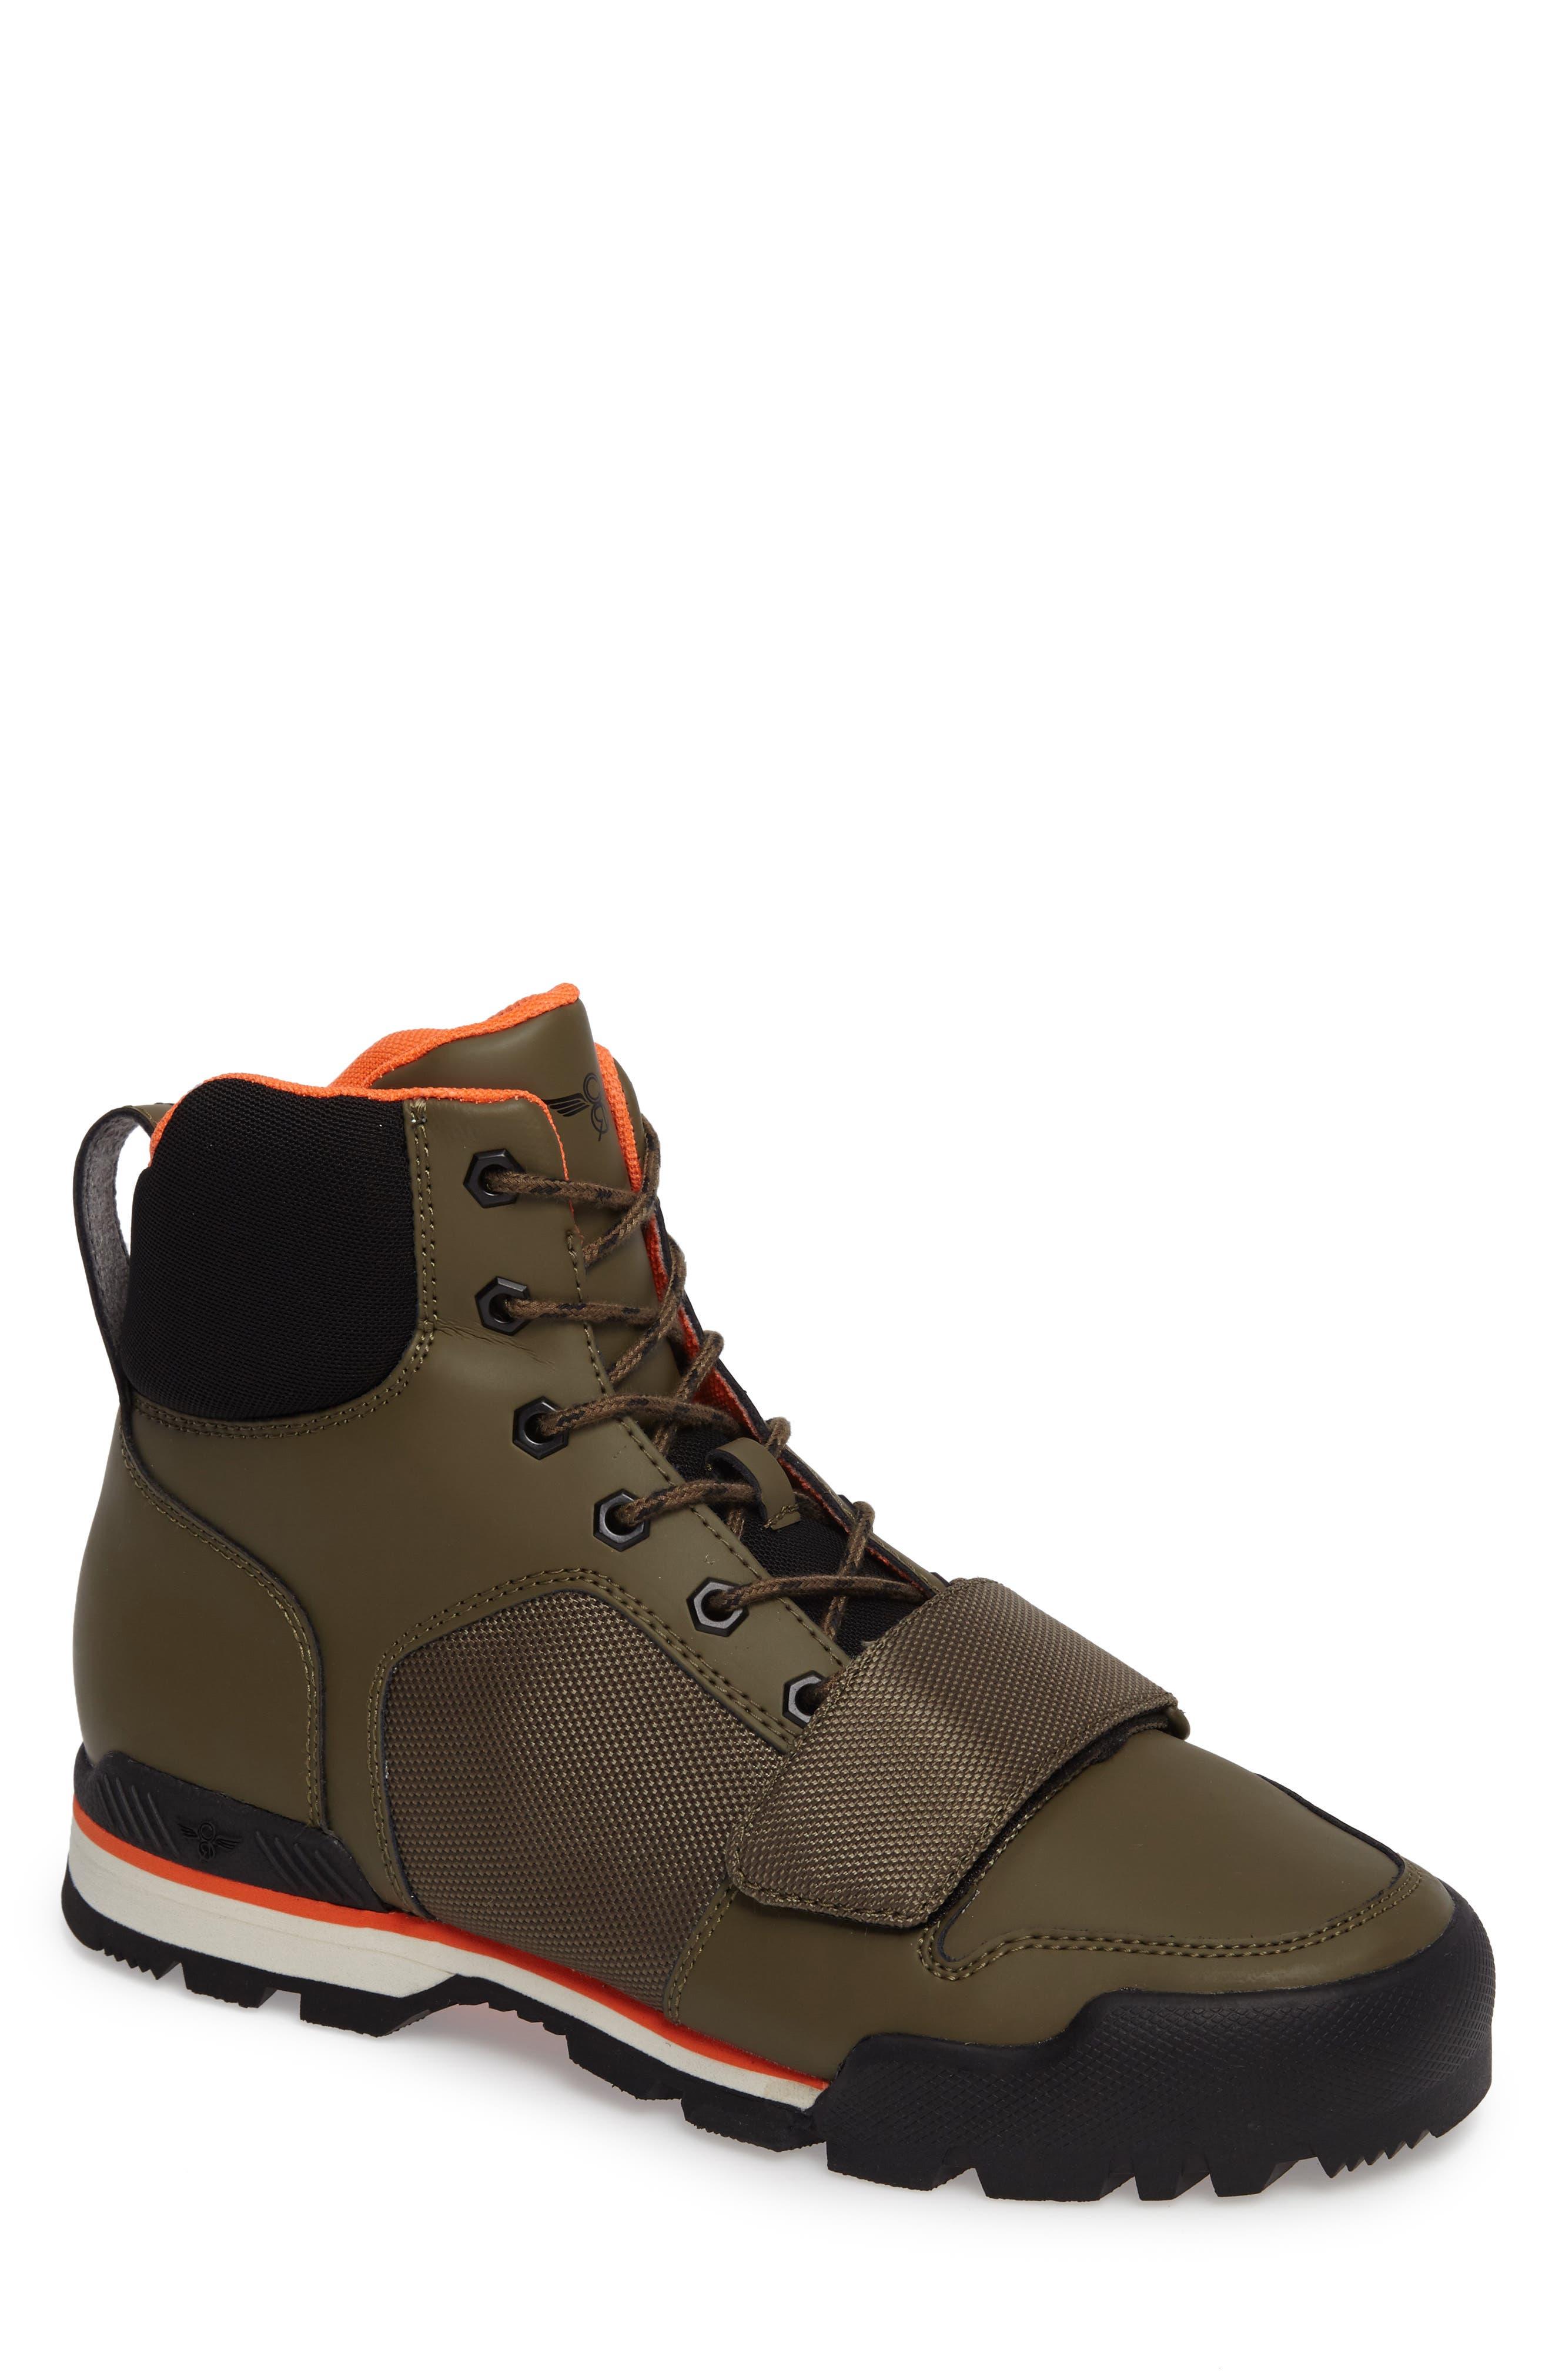 Alternate Image 1 Selected - Creative Recreation Scotto Sneaker (Men)